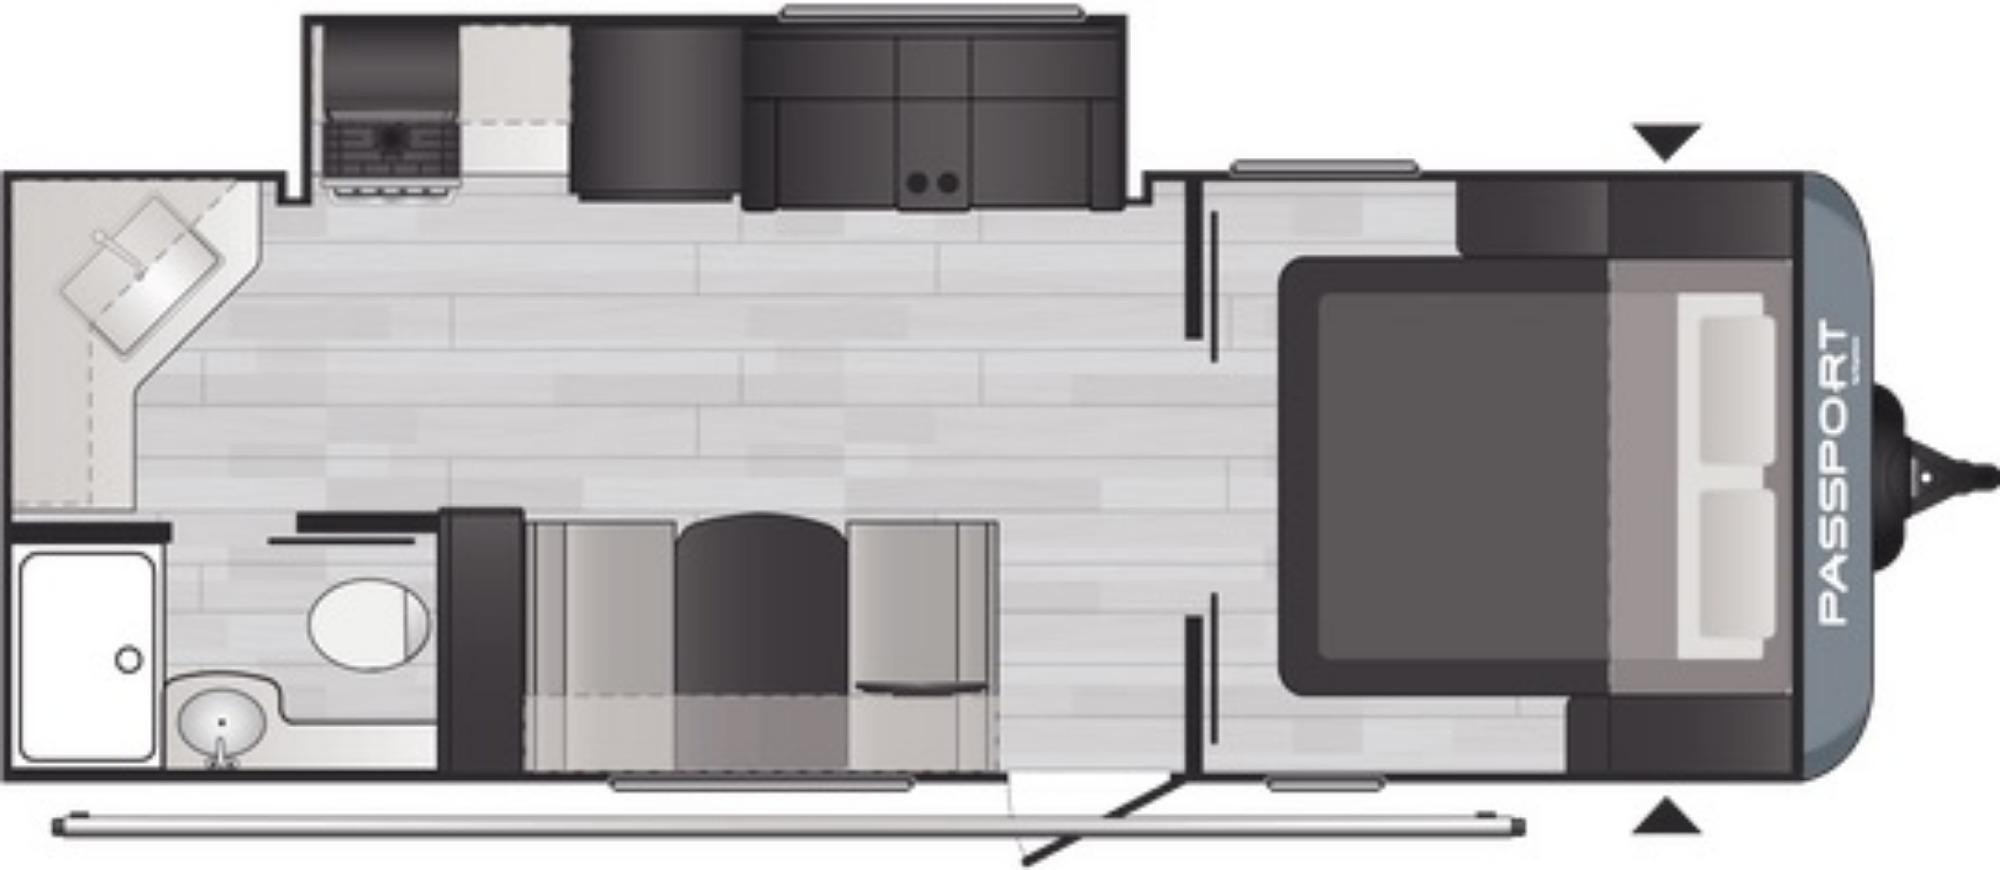 View Floor Plan for 2021 KEYSTONE PASSPORT 229RK